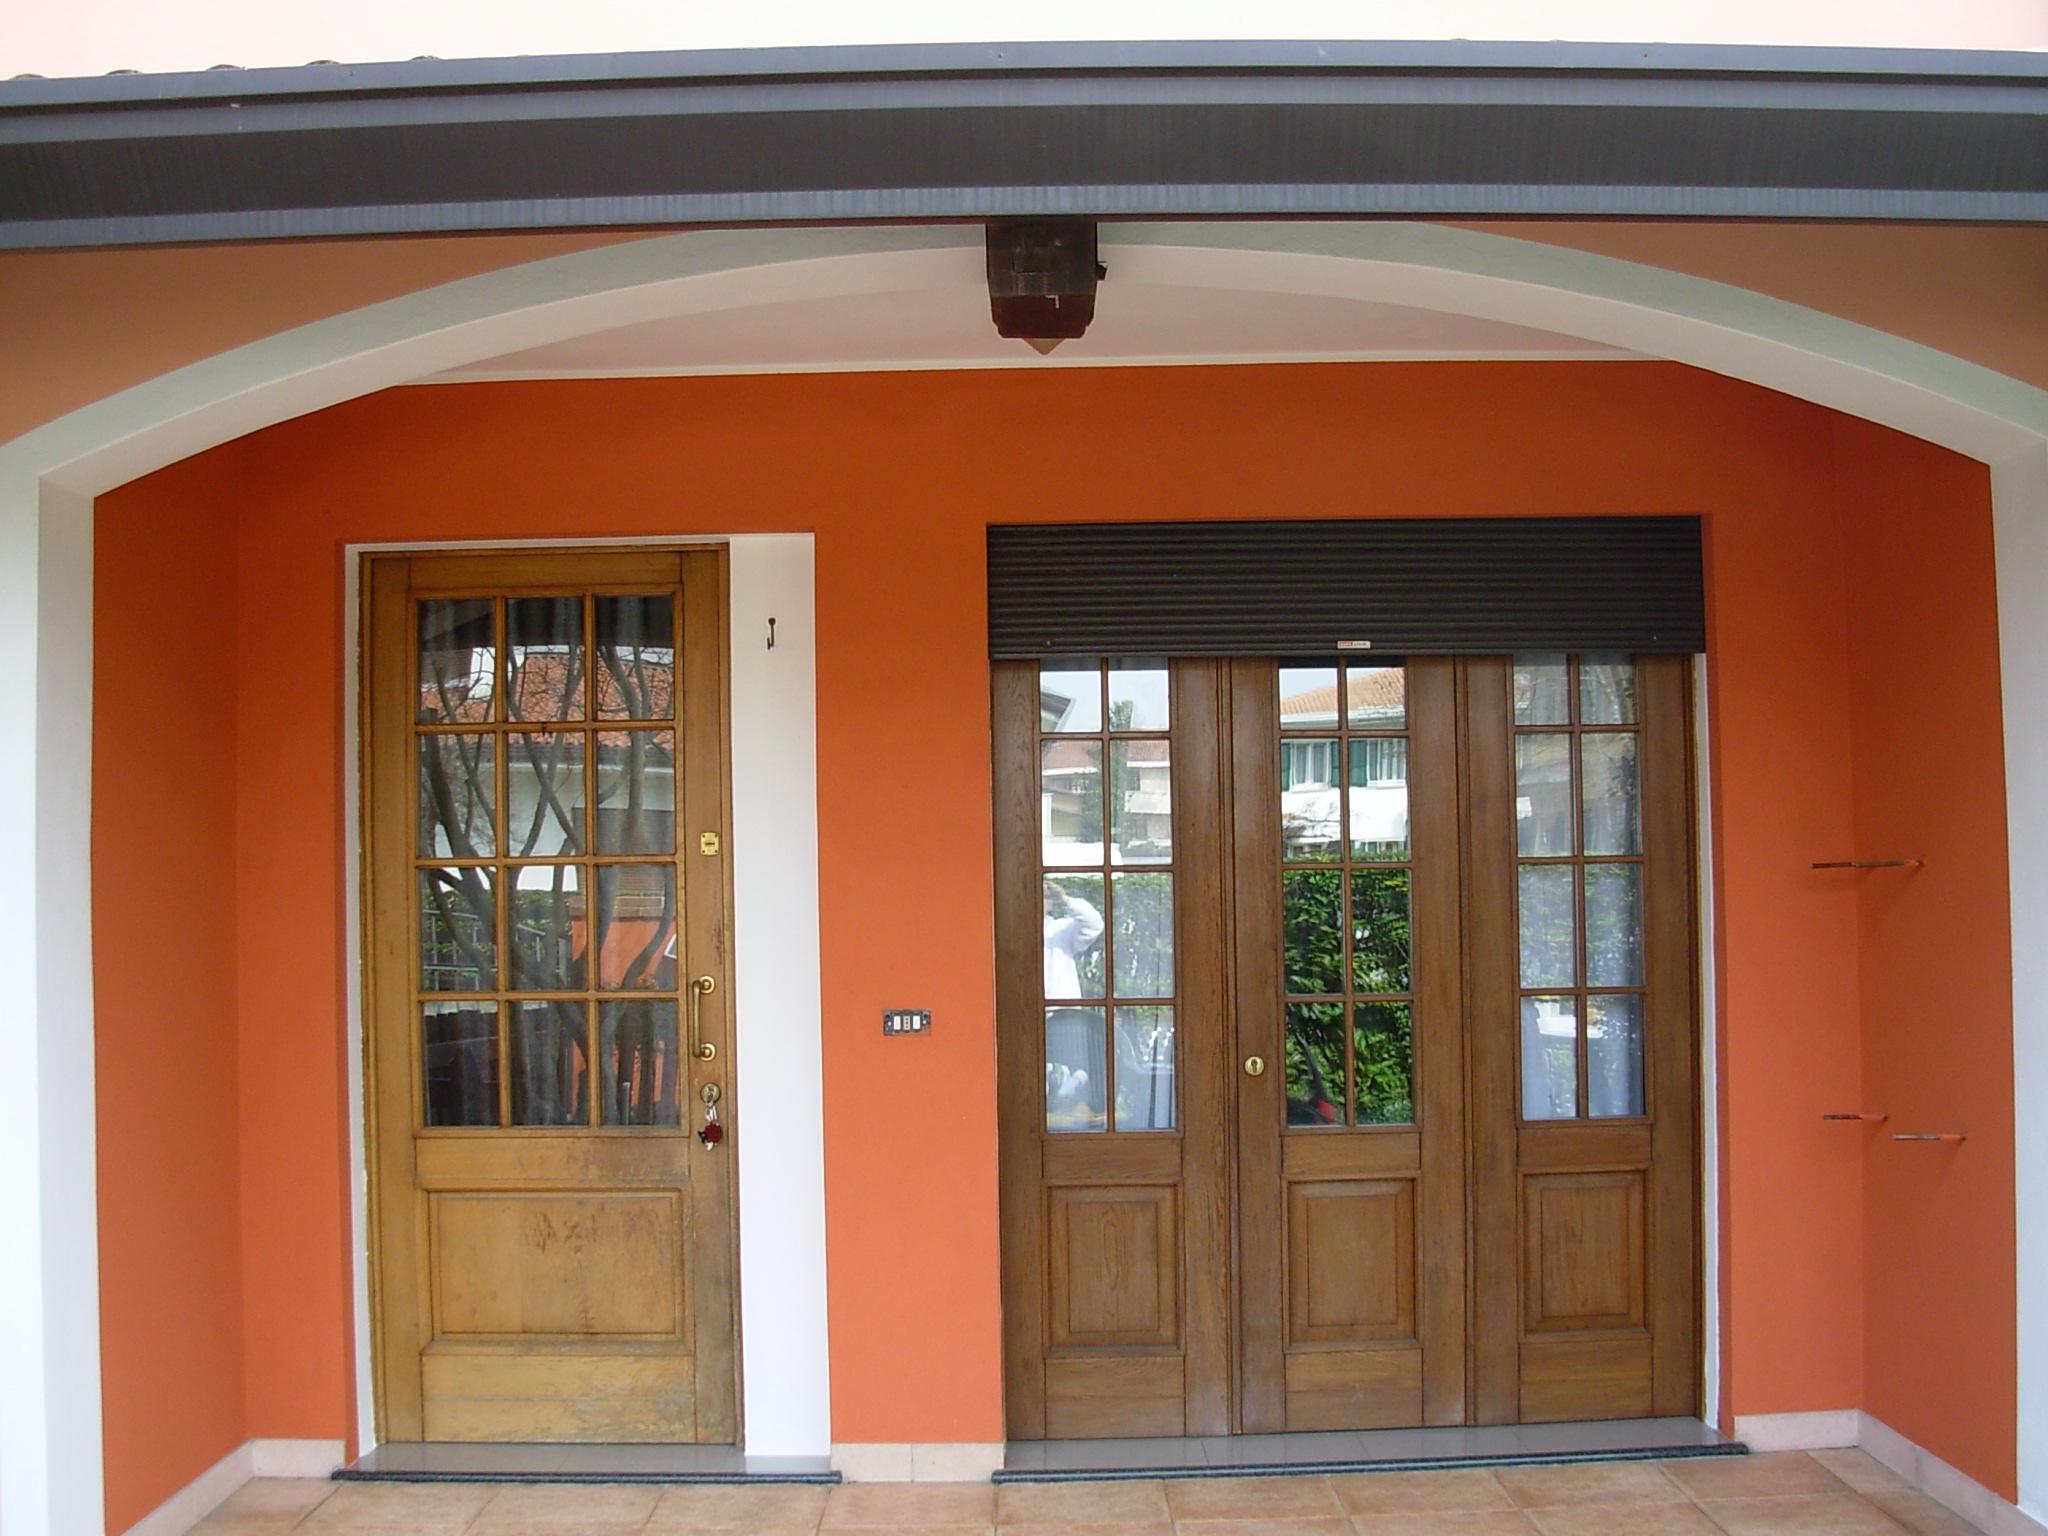 Pitture antimuffa tinteggiatura e pitture per legno - Pitture speciali per interni ...